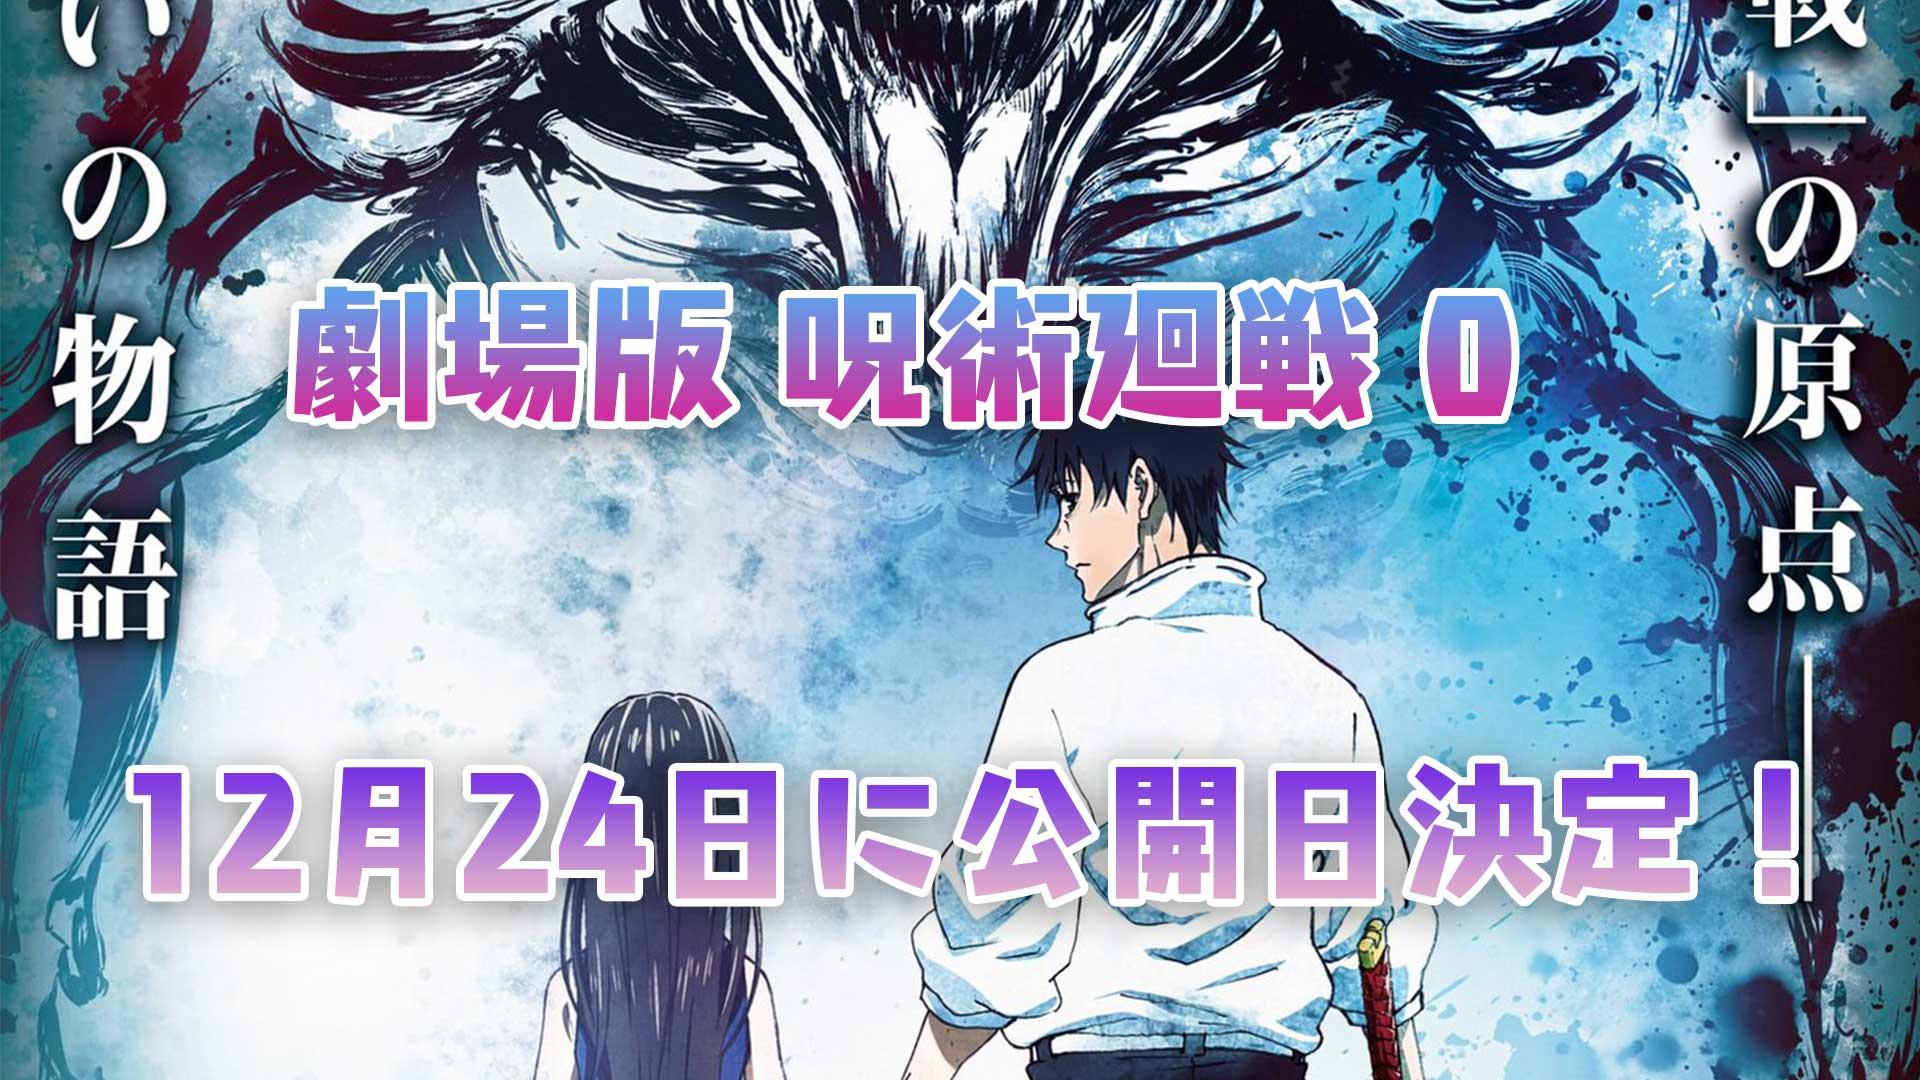 『劇場版 呪術廻戦 0』12月24日に公開日決定!